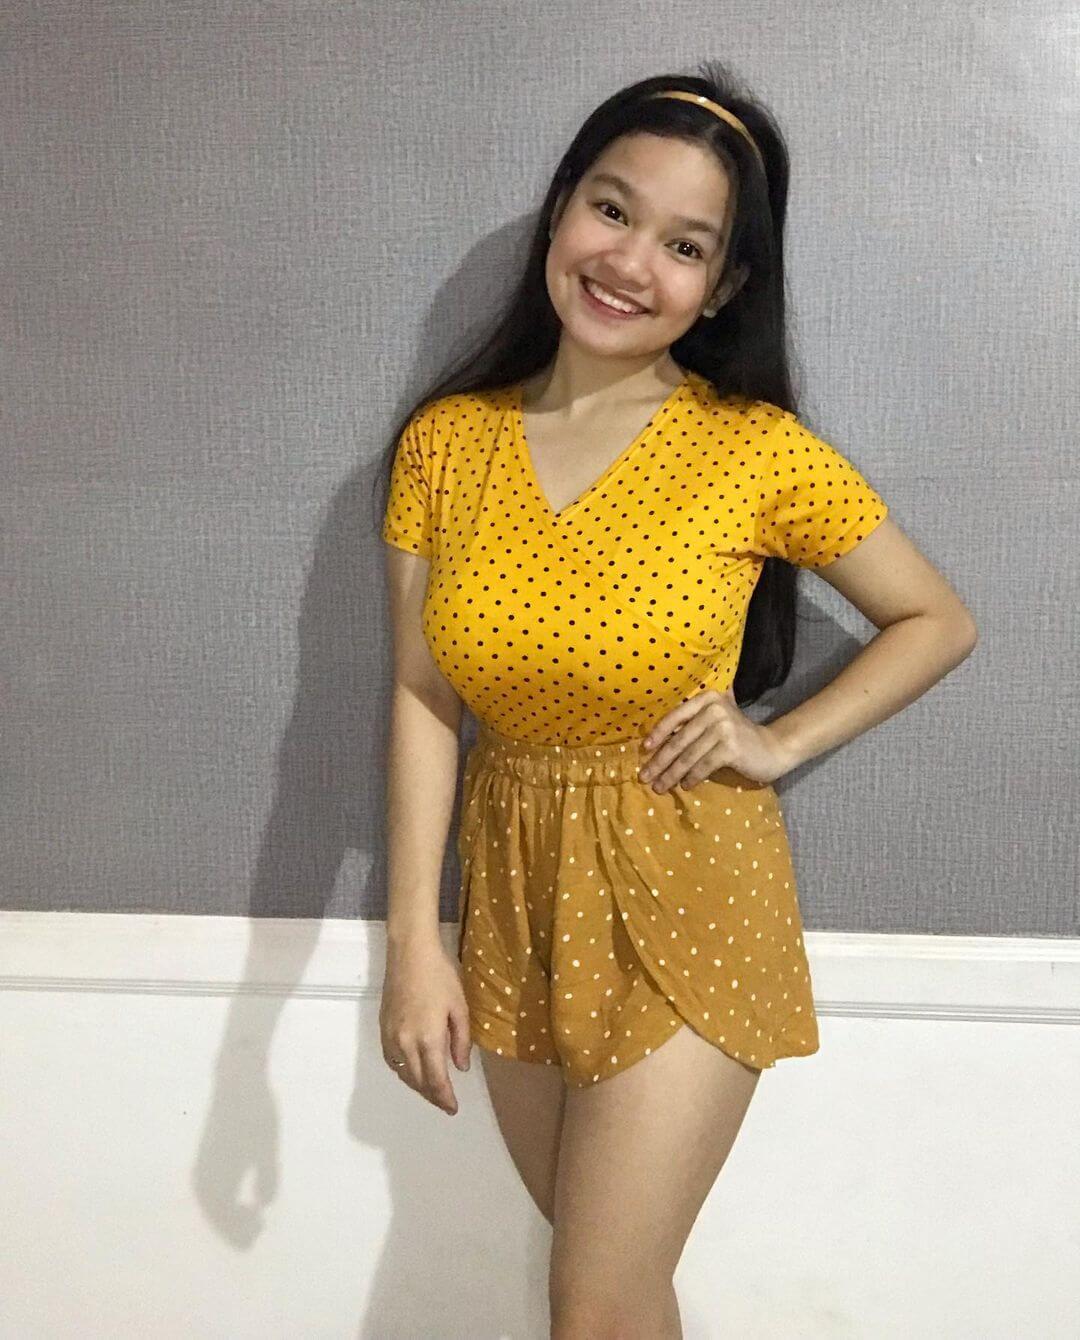 Xyriel Manabat On Yellow Top